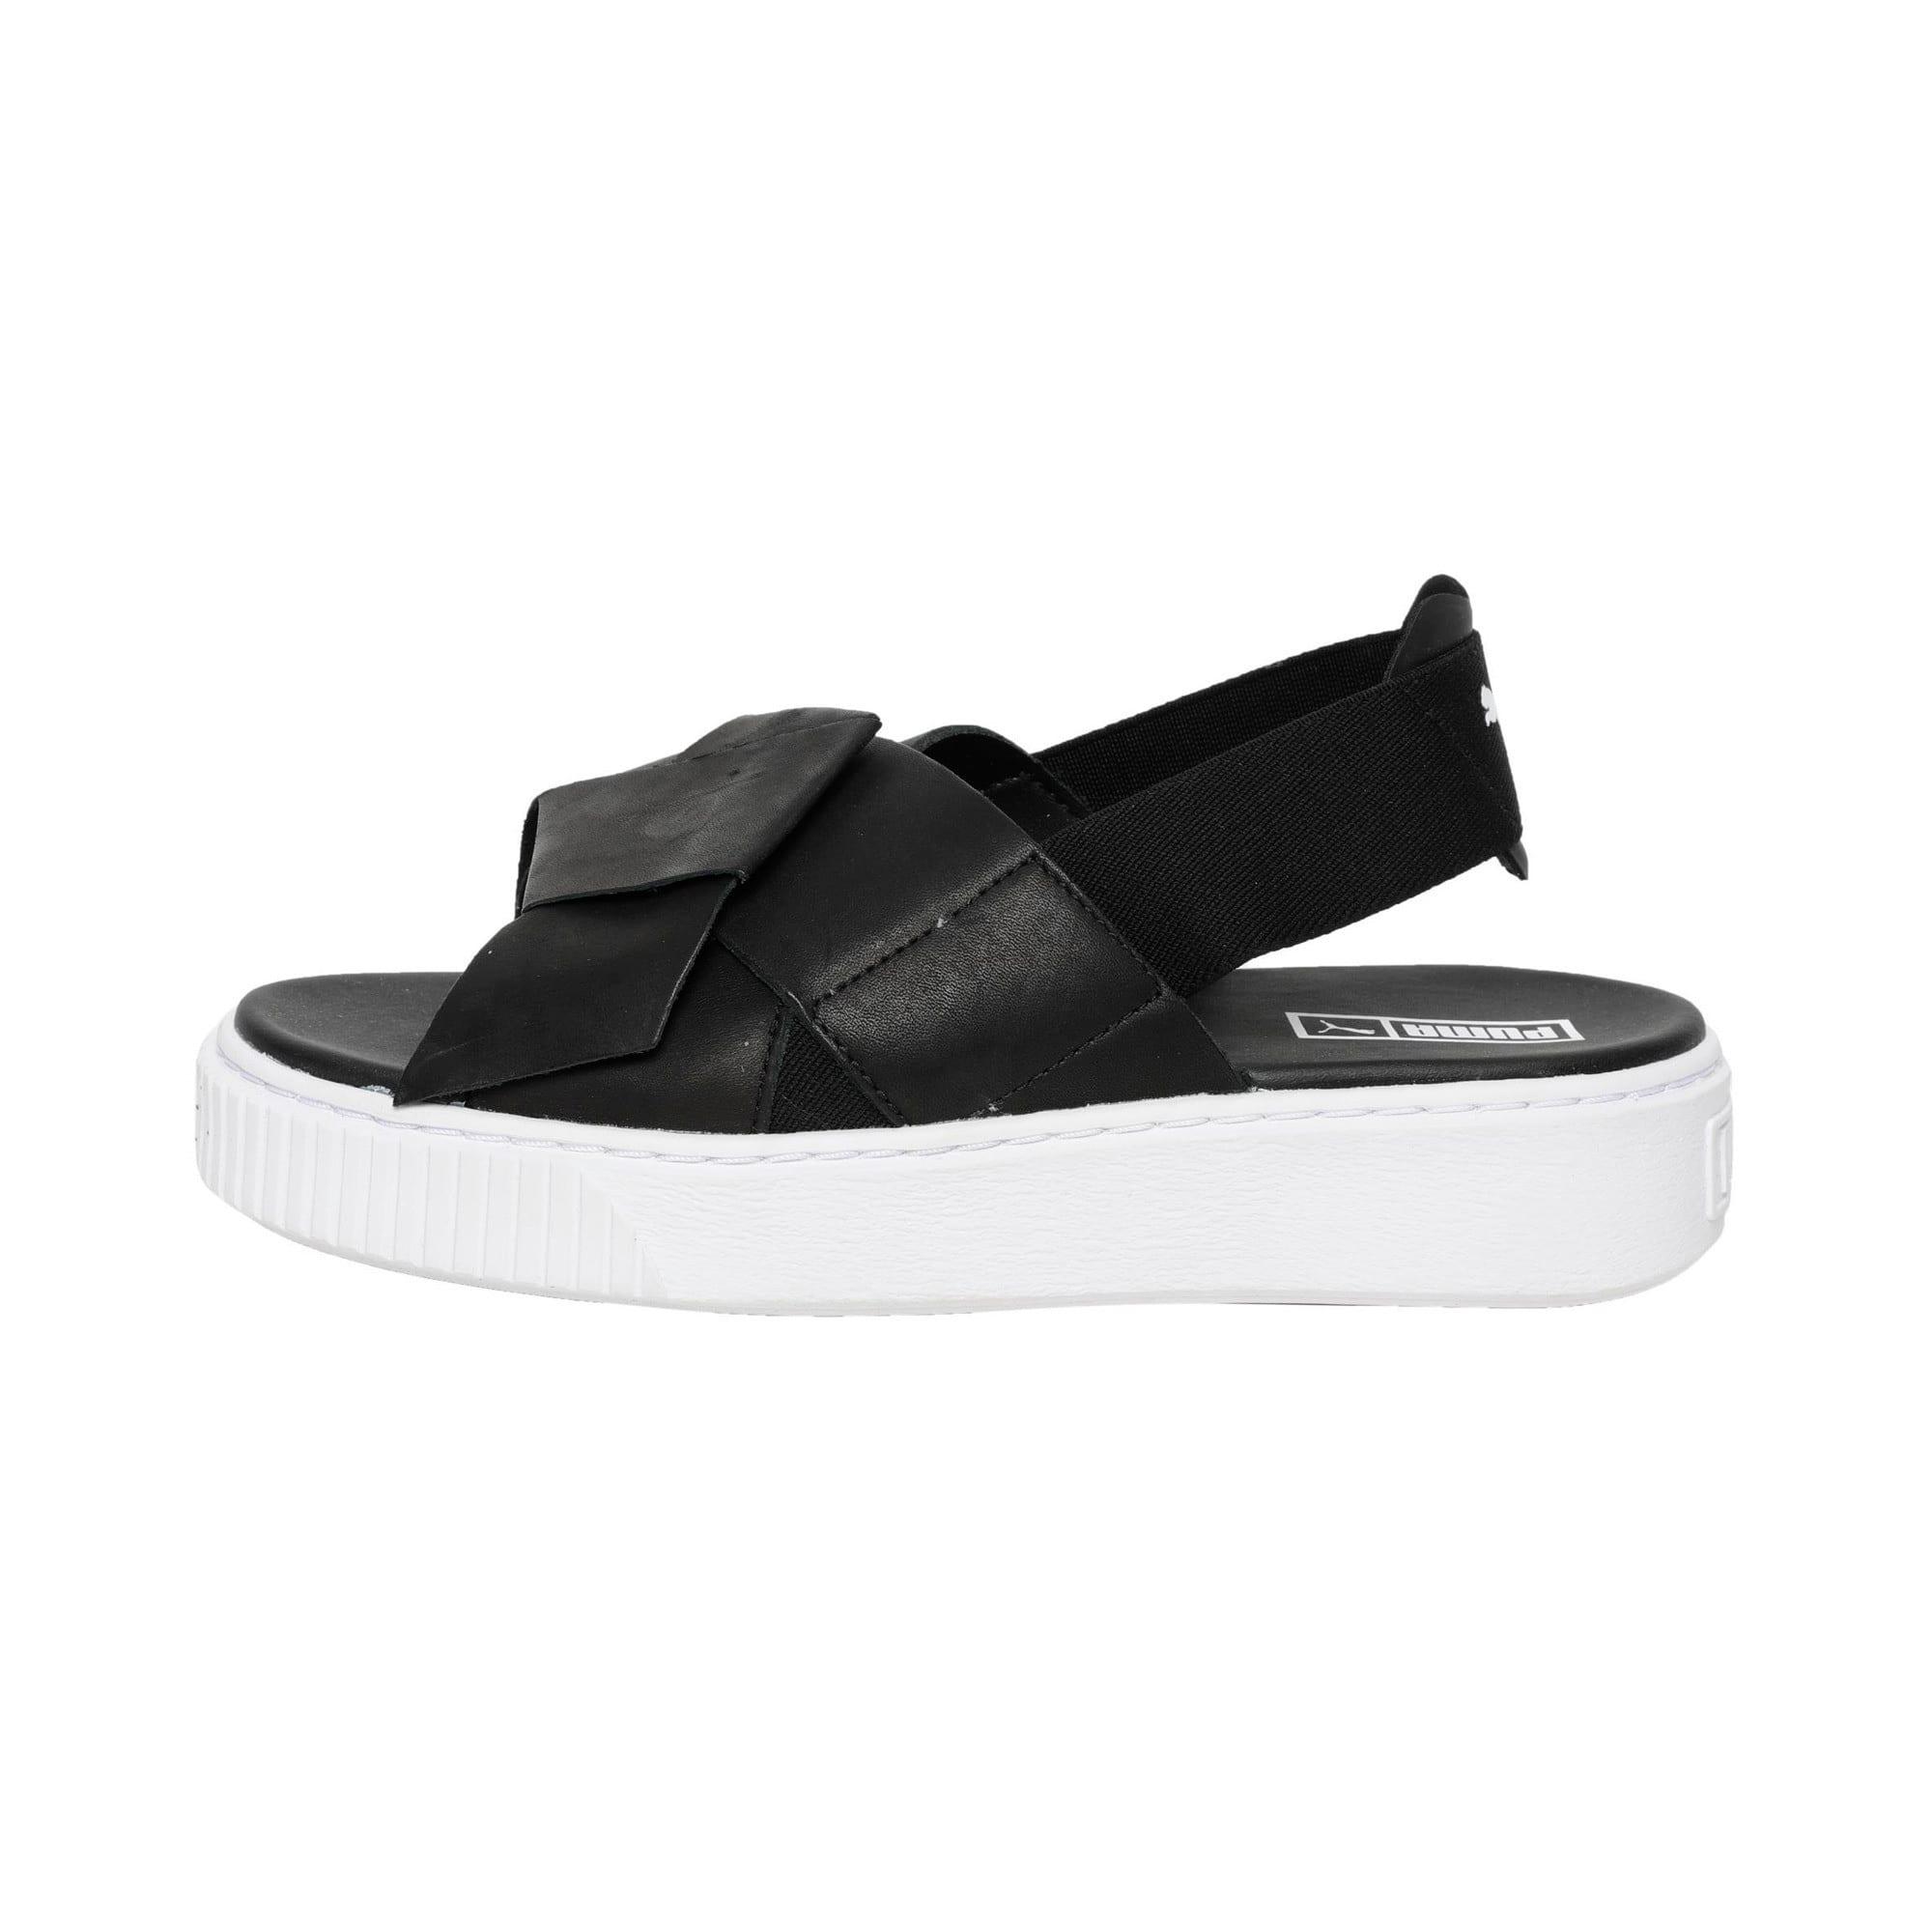 Thumbnail 1 of Platform Leather Women's Sandals, Puma Black-Puma Black, medium-IND